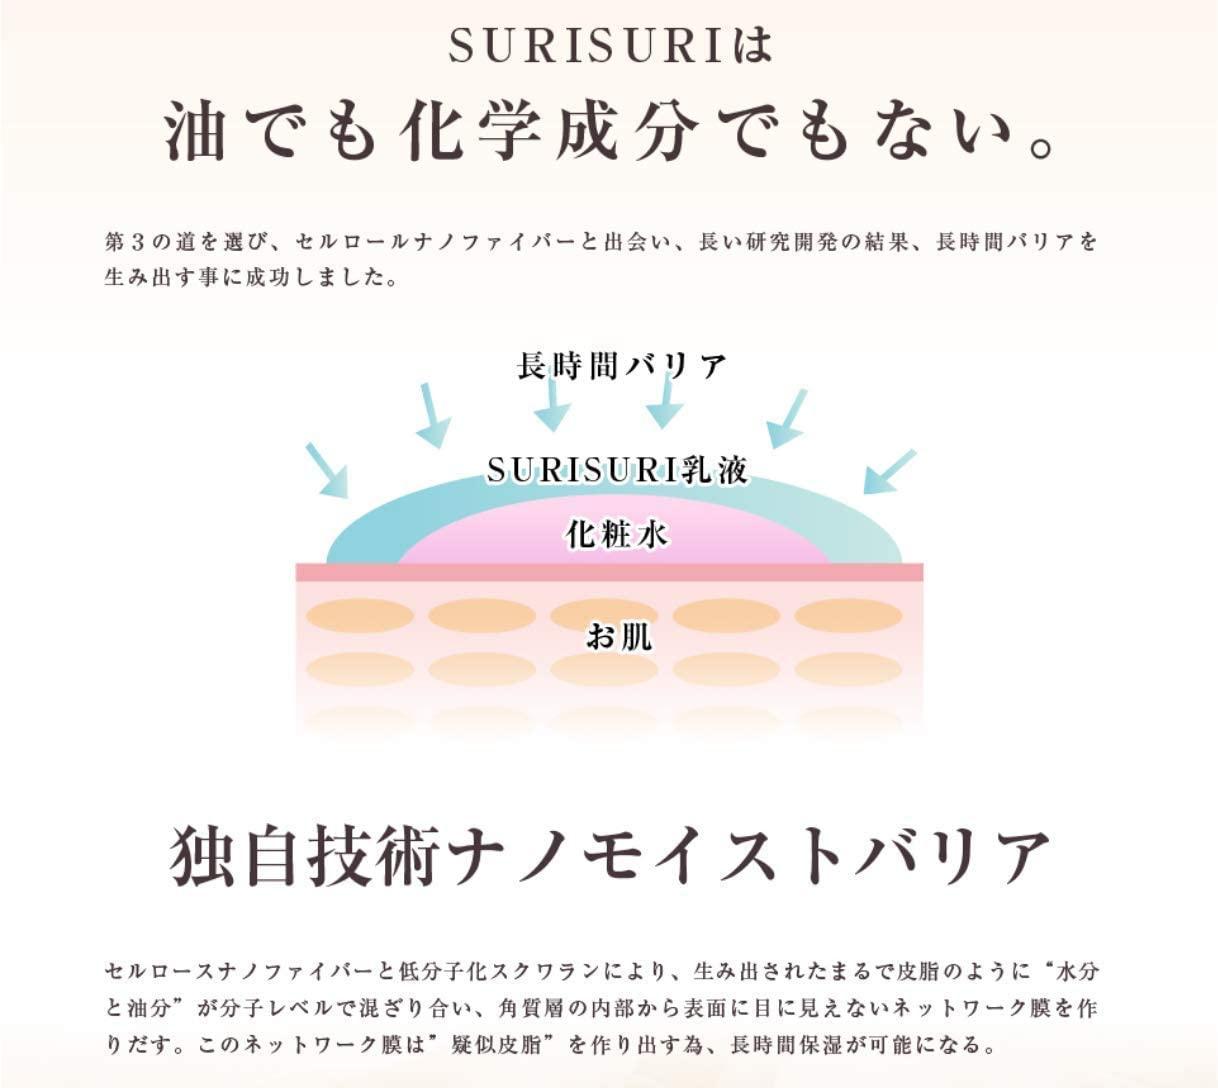 SURISURI(スリスリ) エマルジョン (乳液)の商品画像11